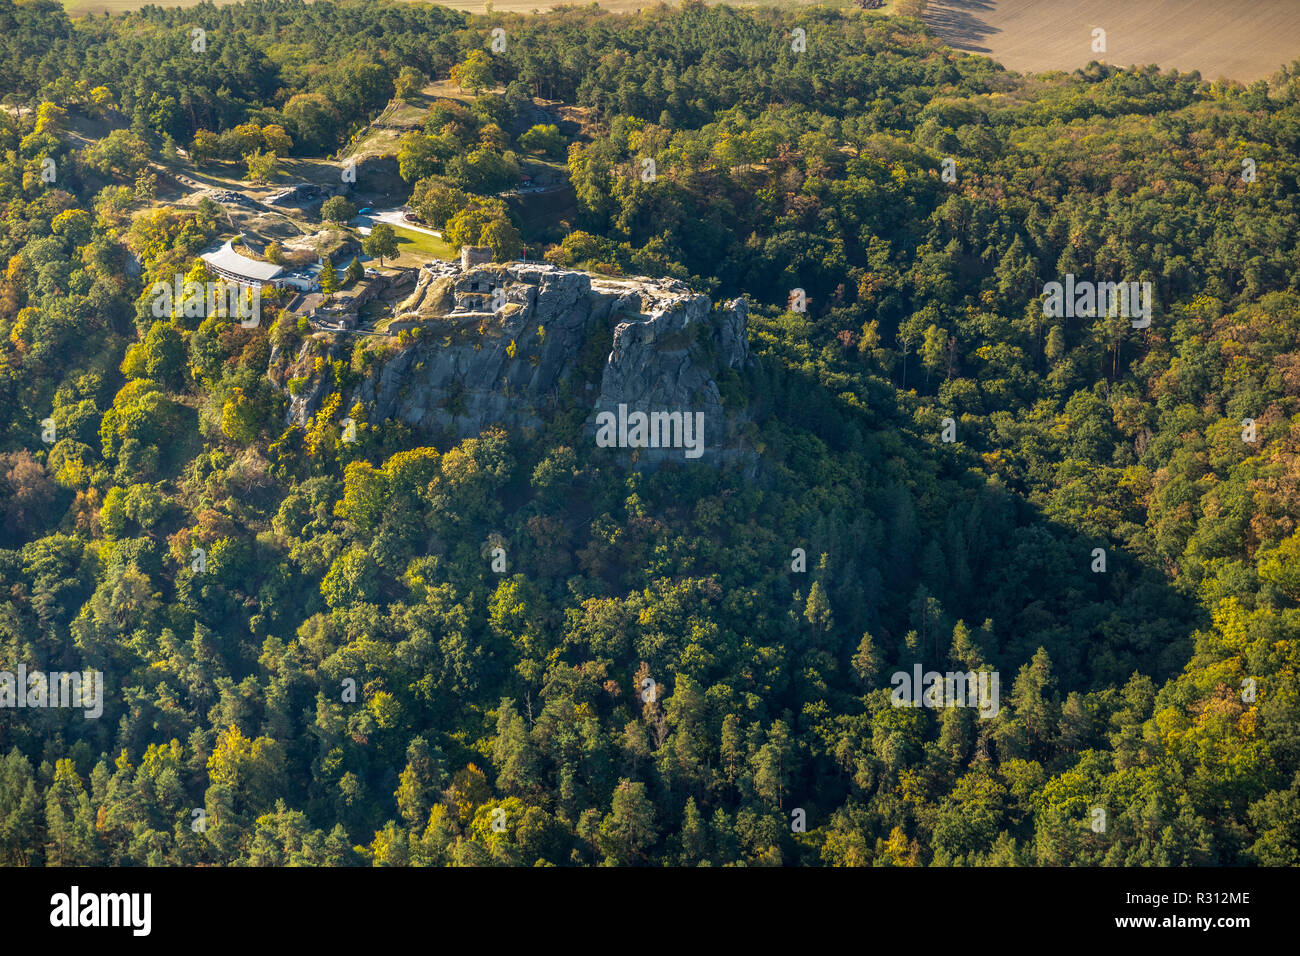 Luftbild, Regenstein Castle and Fortress, Am Platenberg, Blankenburg (Harz), Blankenburg, Paderborn, Saxony-Anhalt, Germany, Europe ,, DEU, Europe, bi - Stock Image